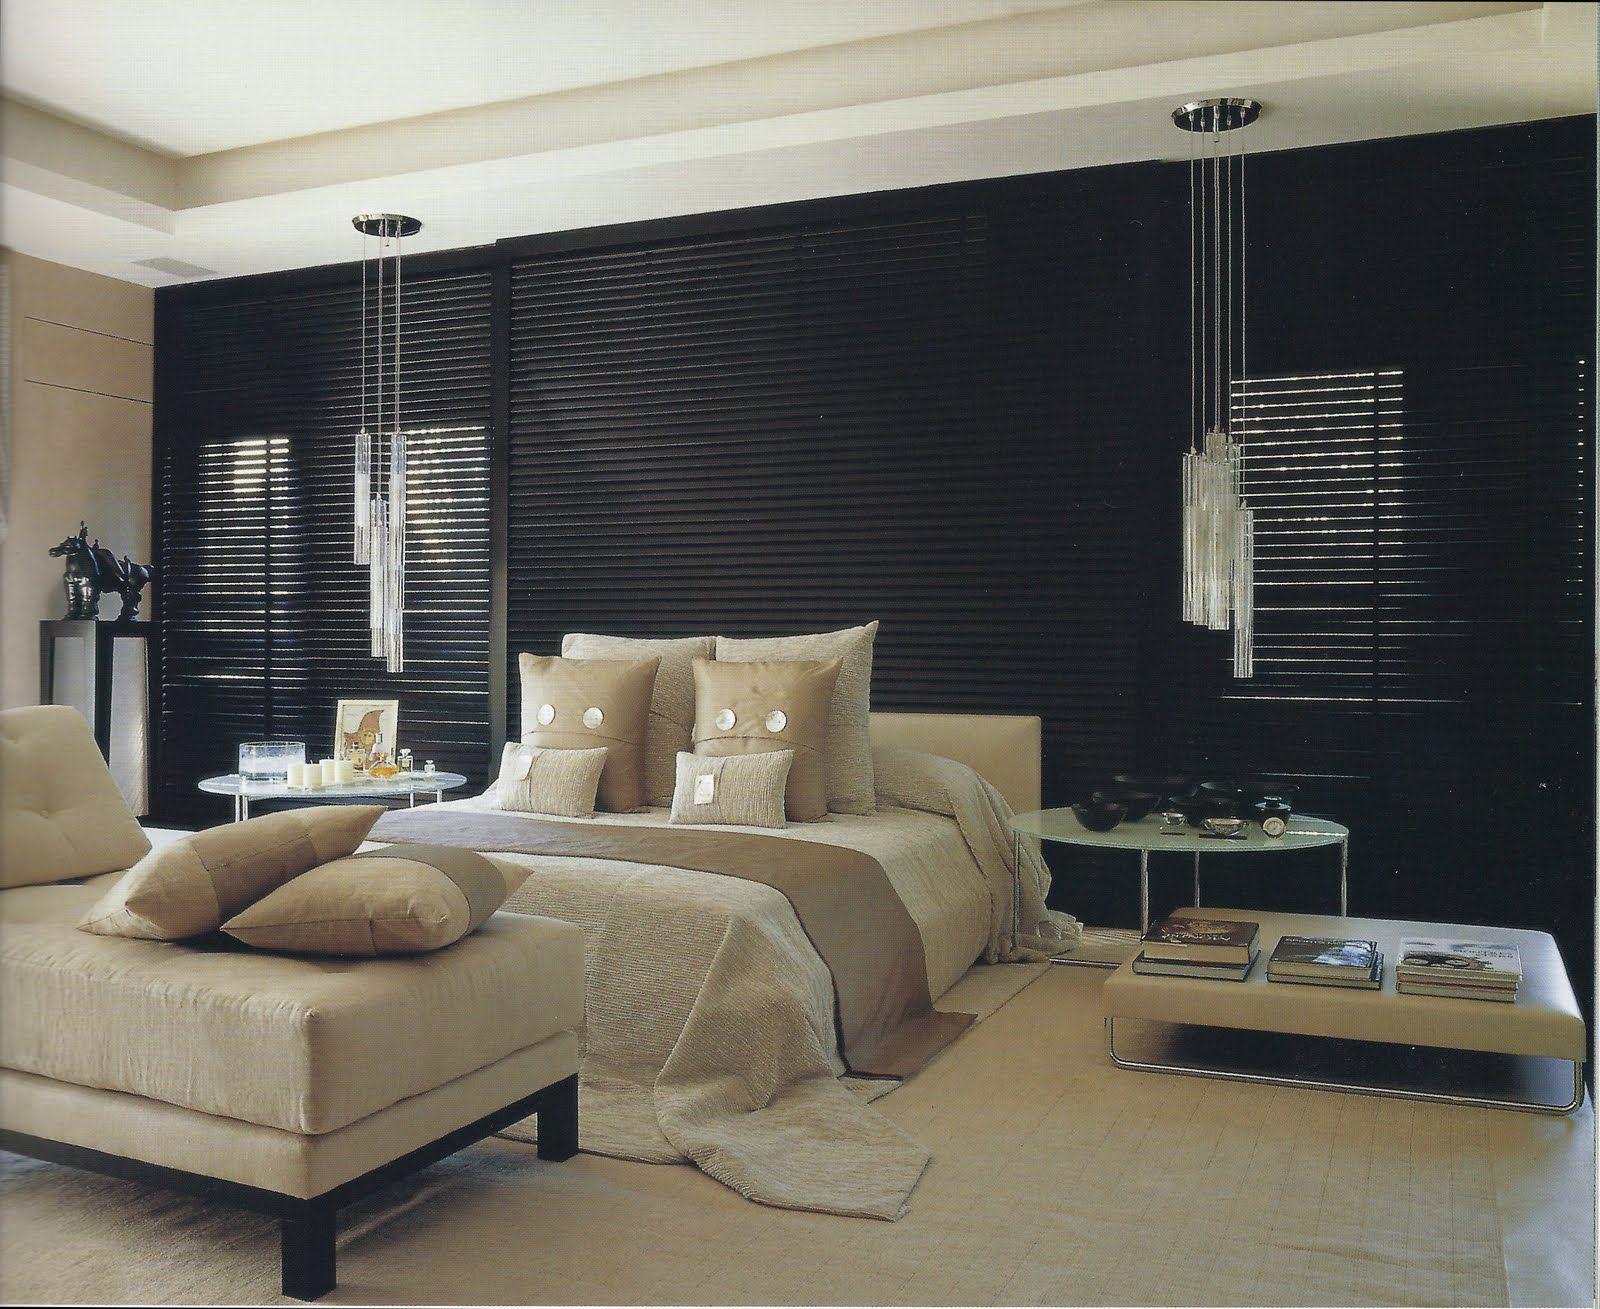 Subtle Glamour For A Master Bedroom Bedroom Ideas